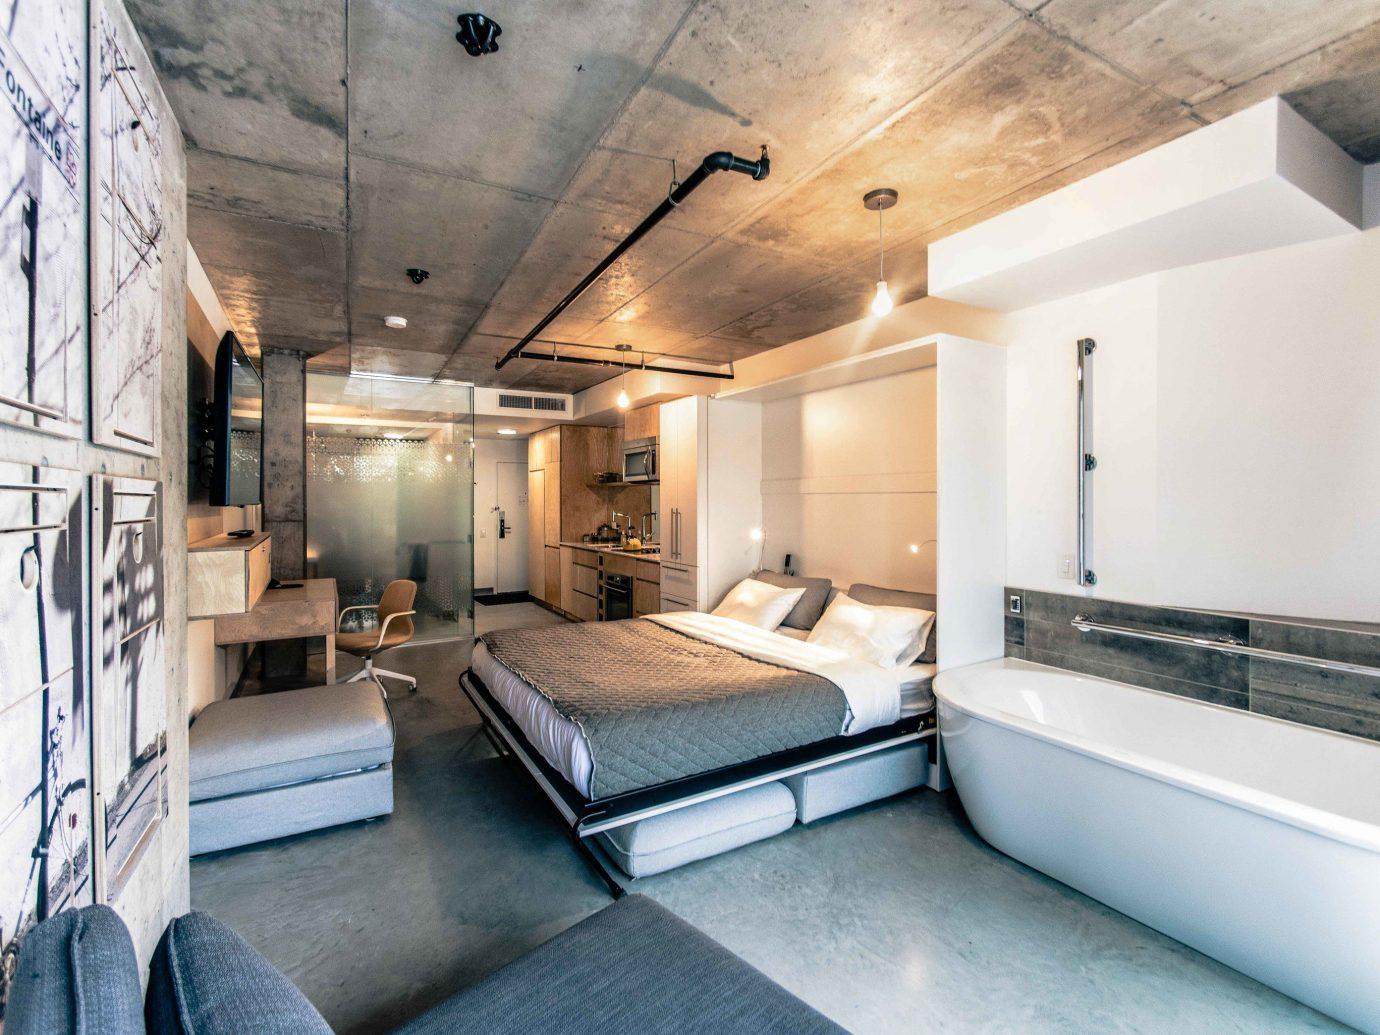 Boutique Hotels Chicago Hotels indoor floor ceiling room interior design loft Suite